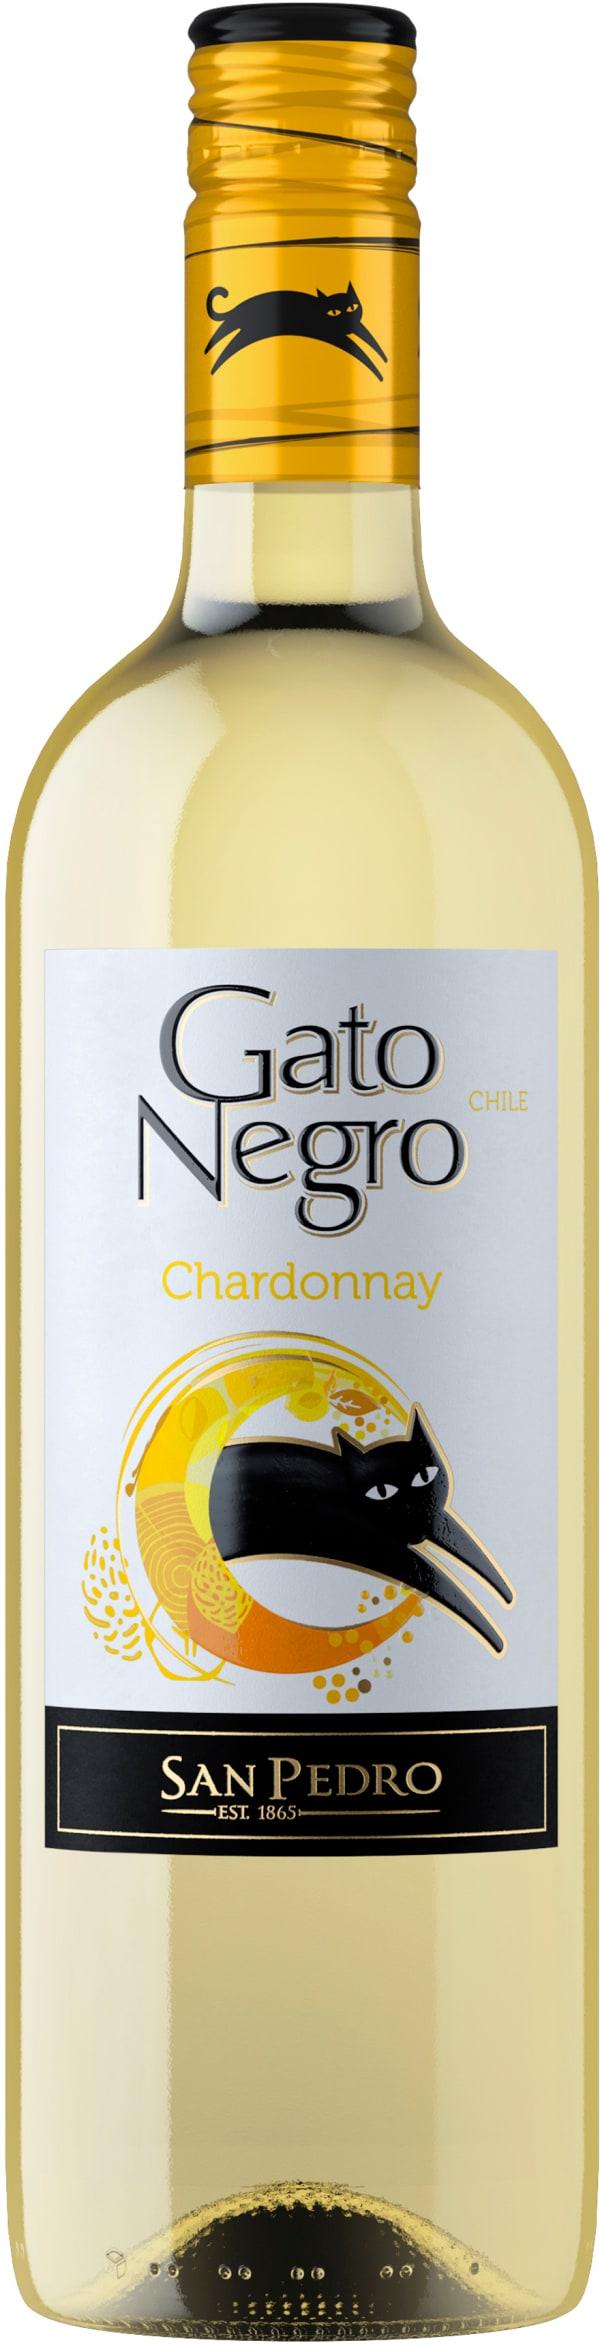 Gato Negro Chardonnay 2018